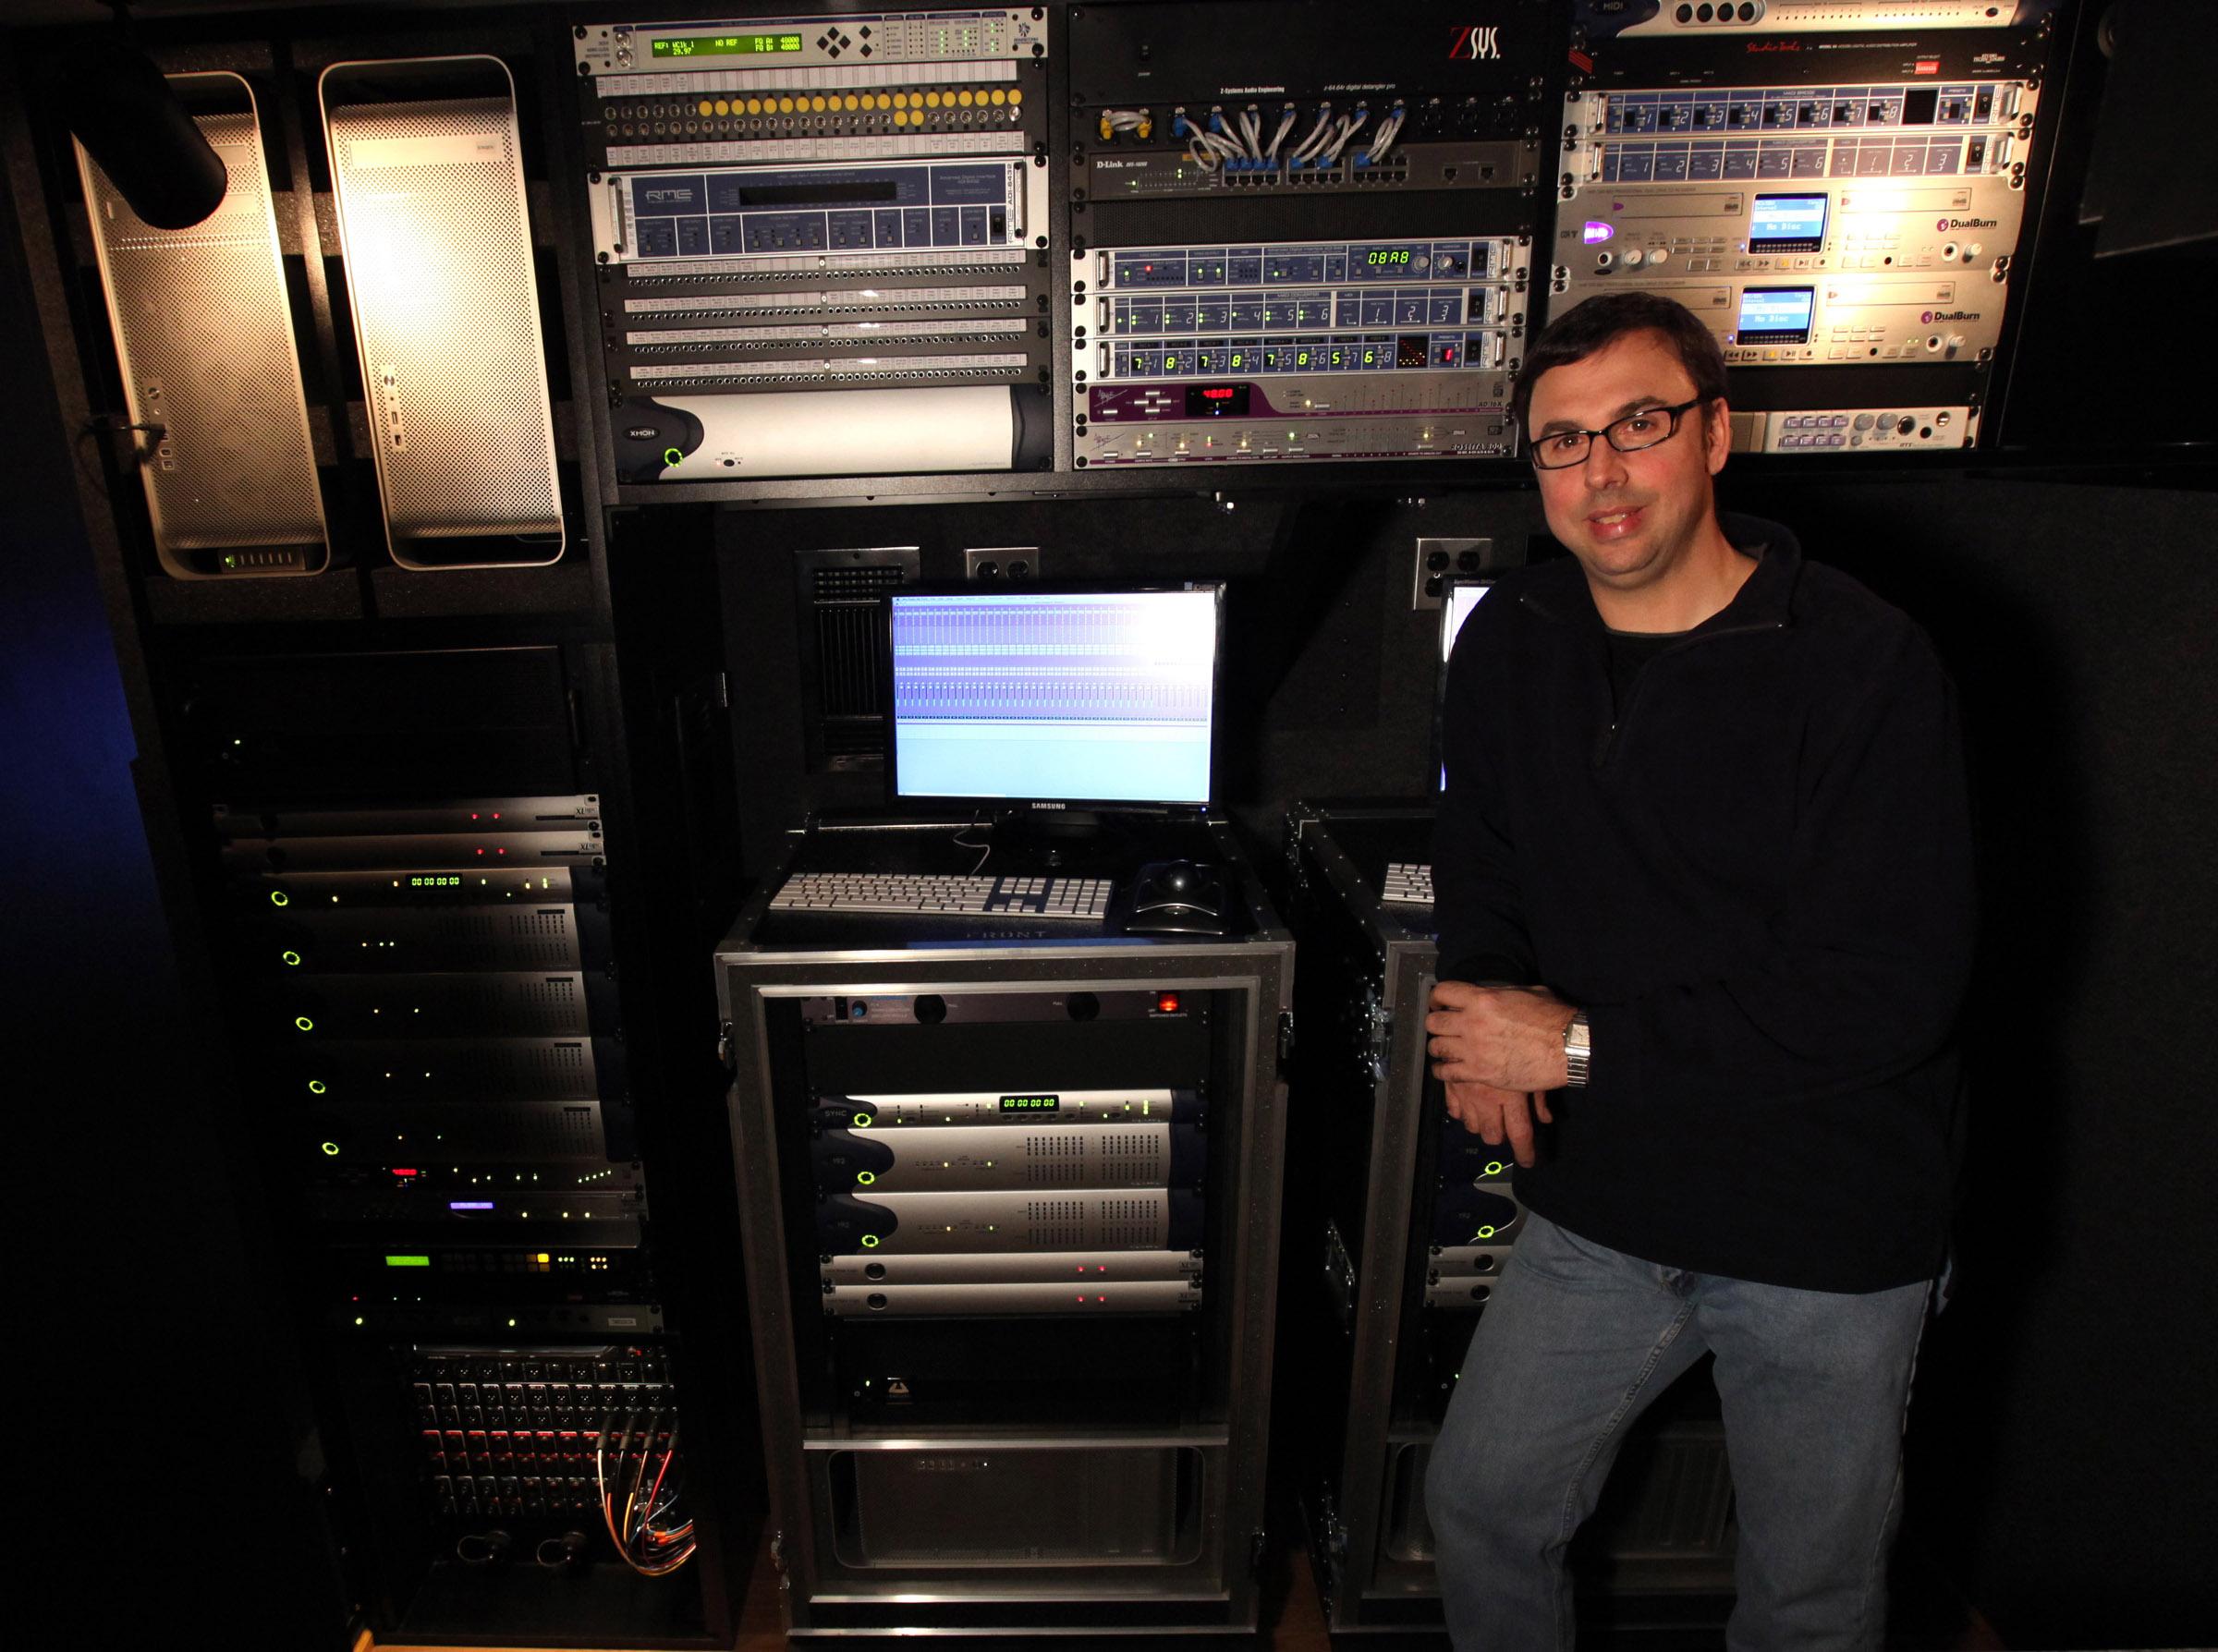 http://www.clynemedia.com/Aphex/M3_Fall12/M3_Joel_Singer_Chief_Engineer.jpg